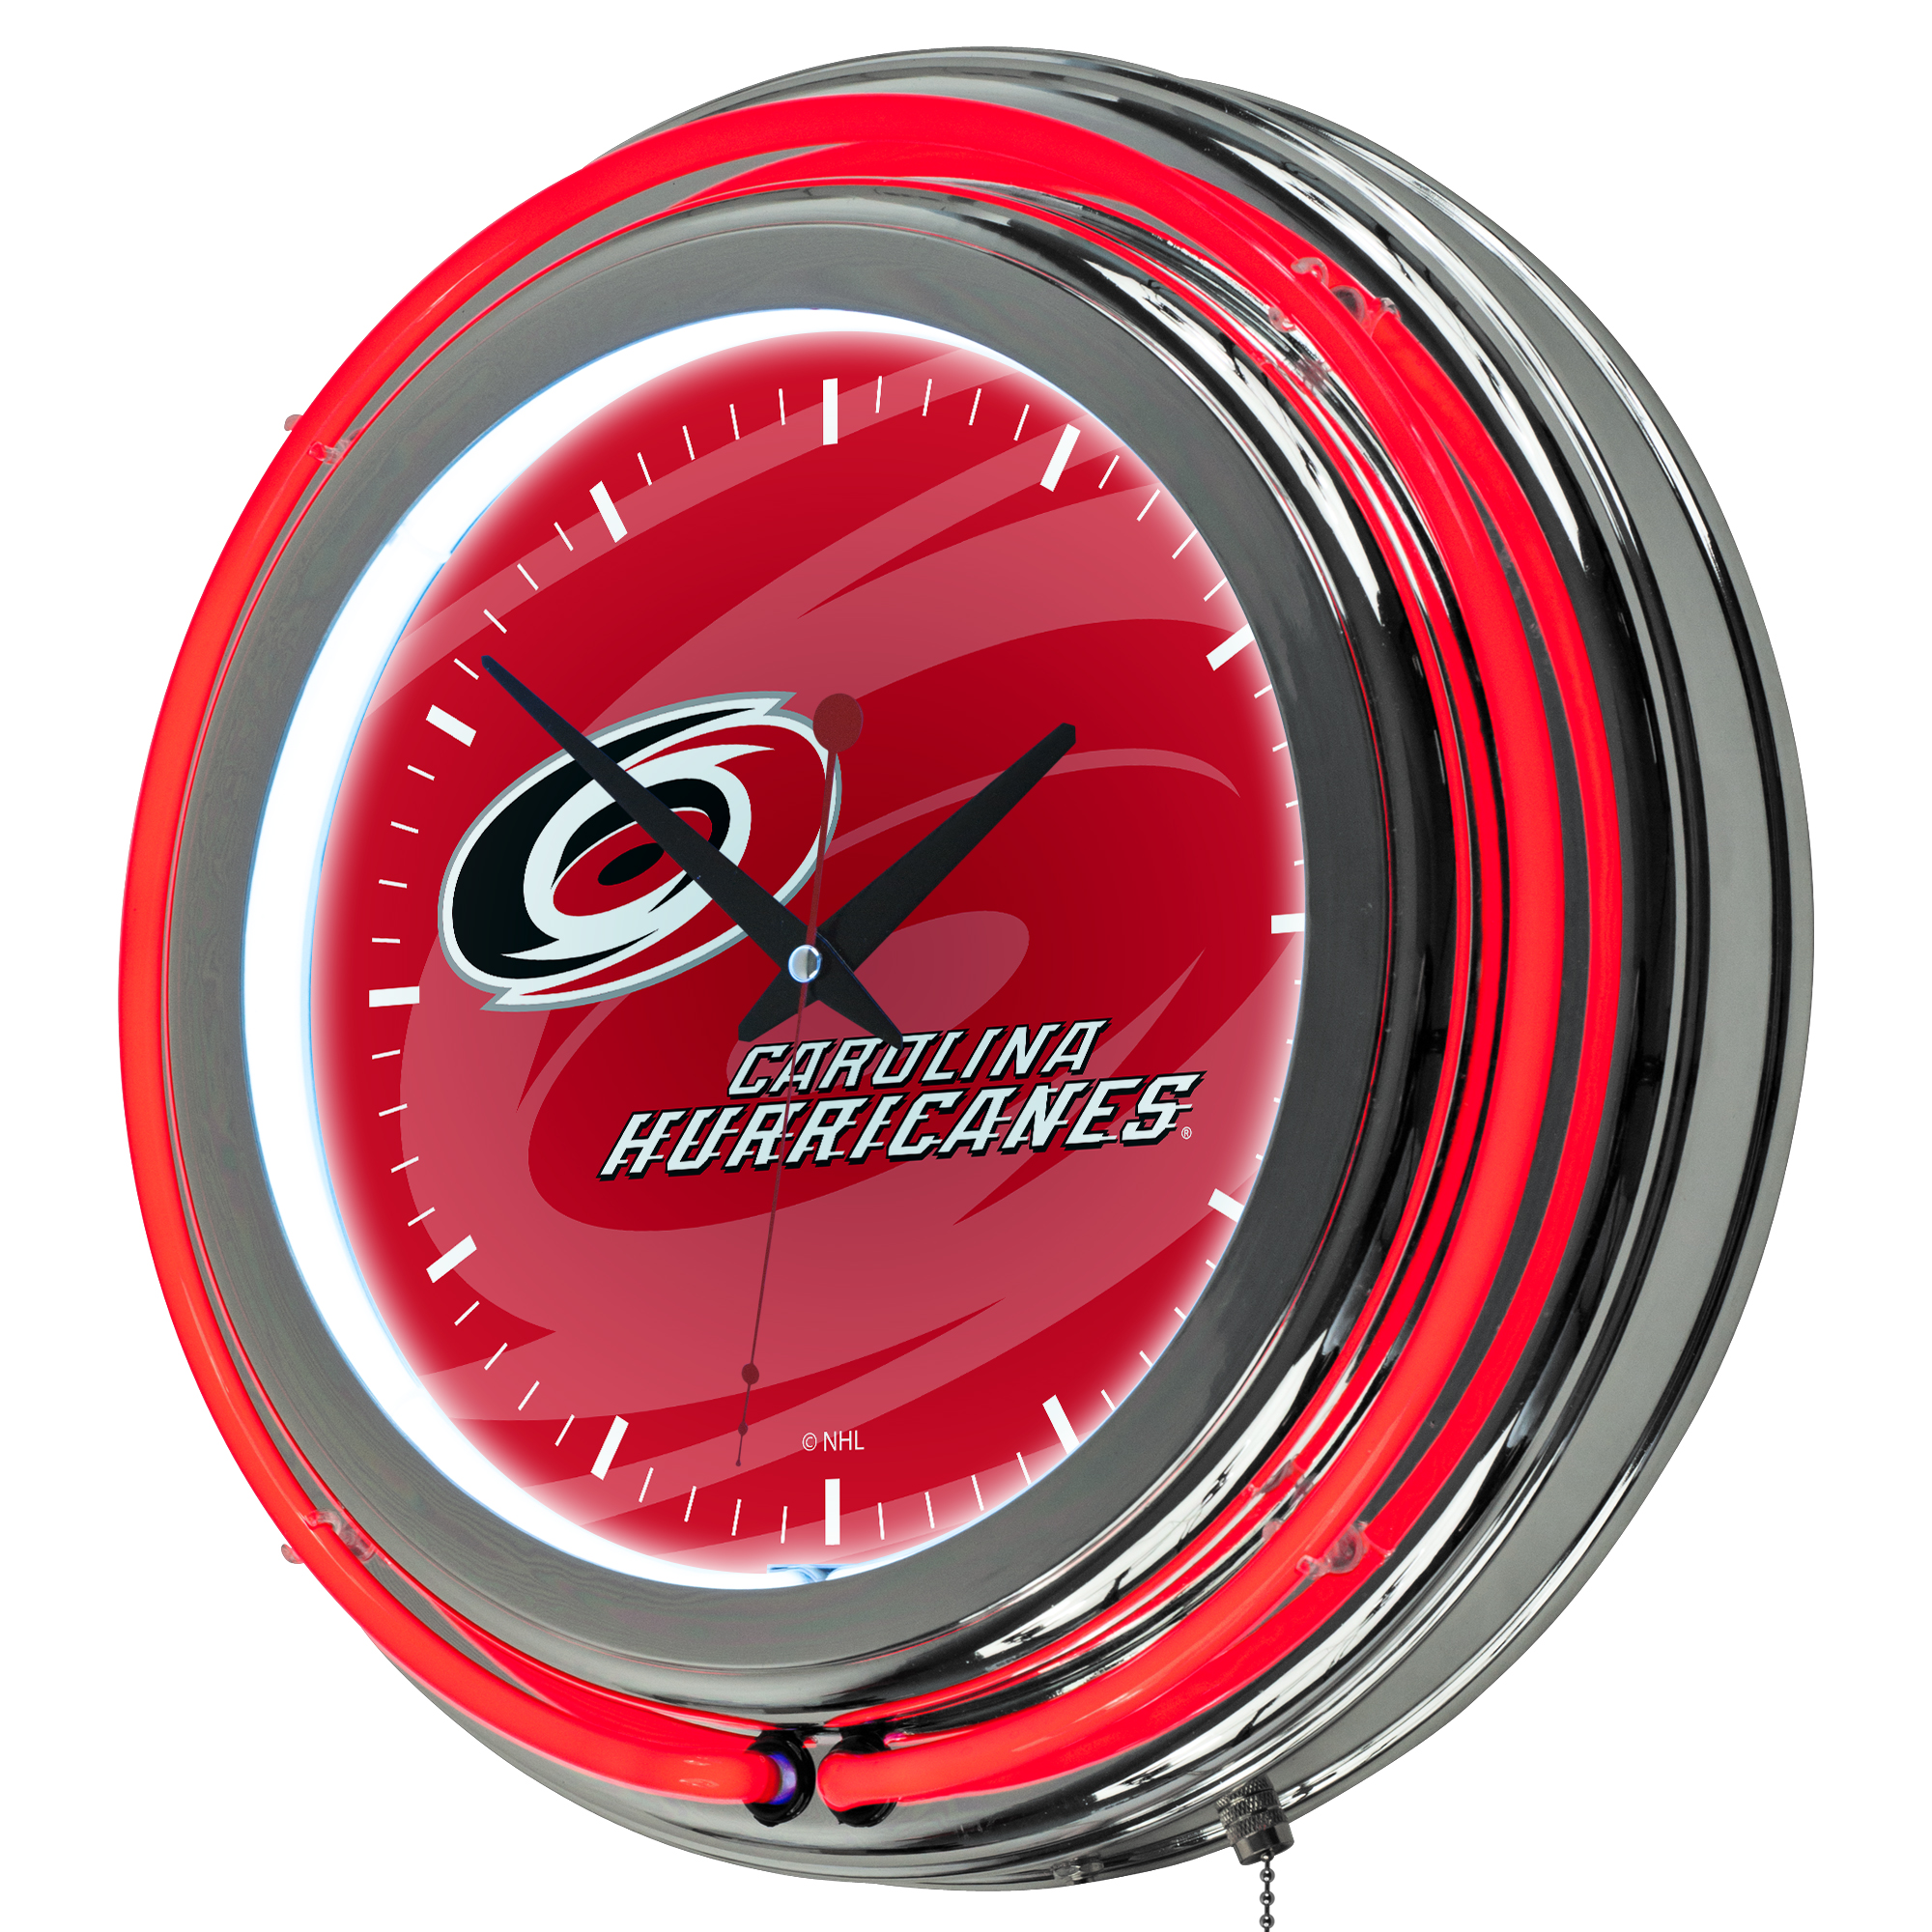 NHL Chrome Double Rung Neon Clock - Watermark - Carolina Hurricanes